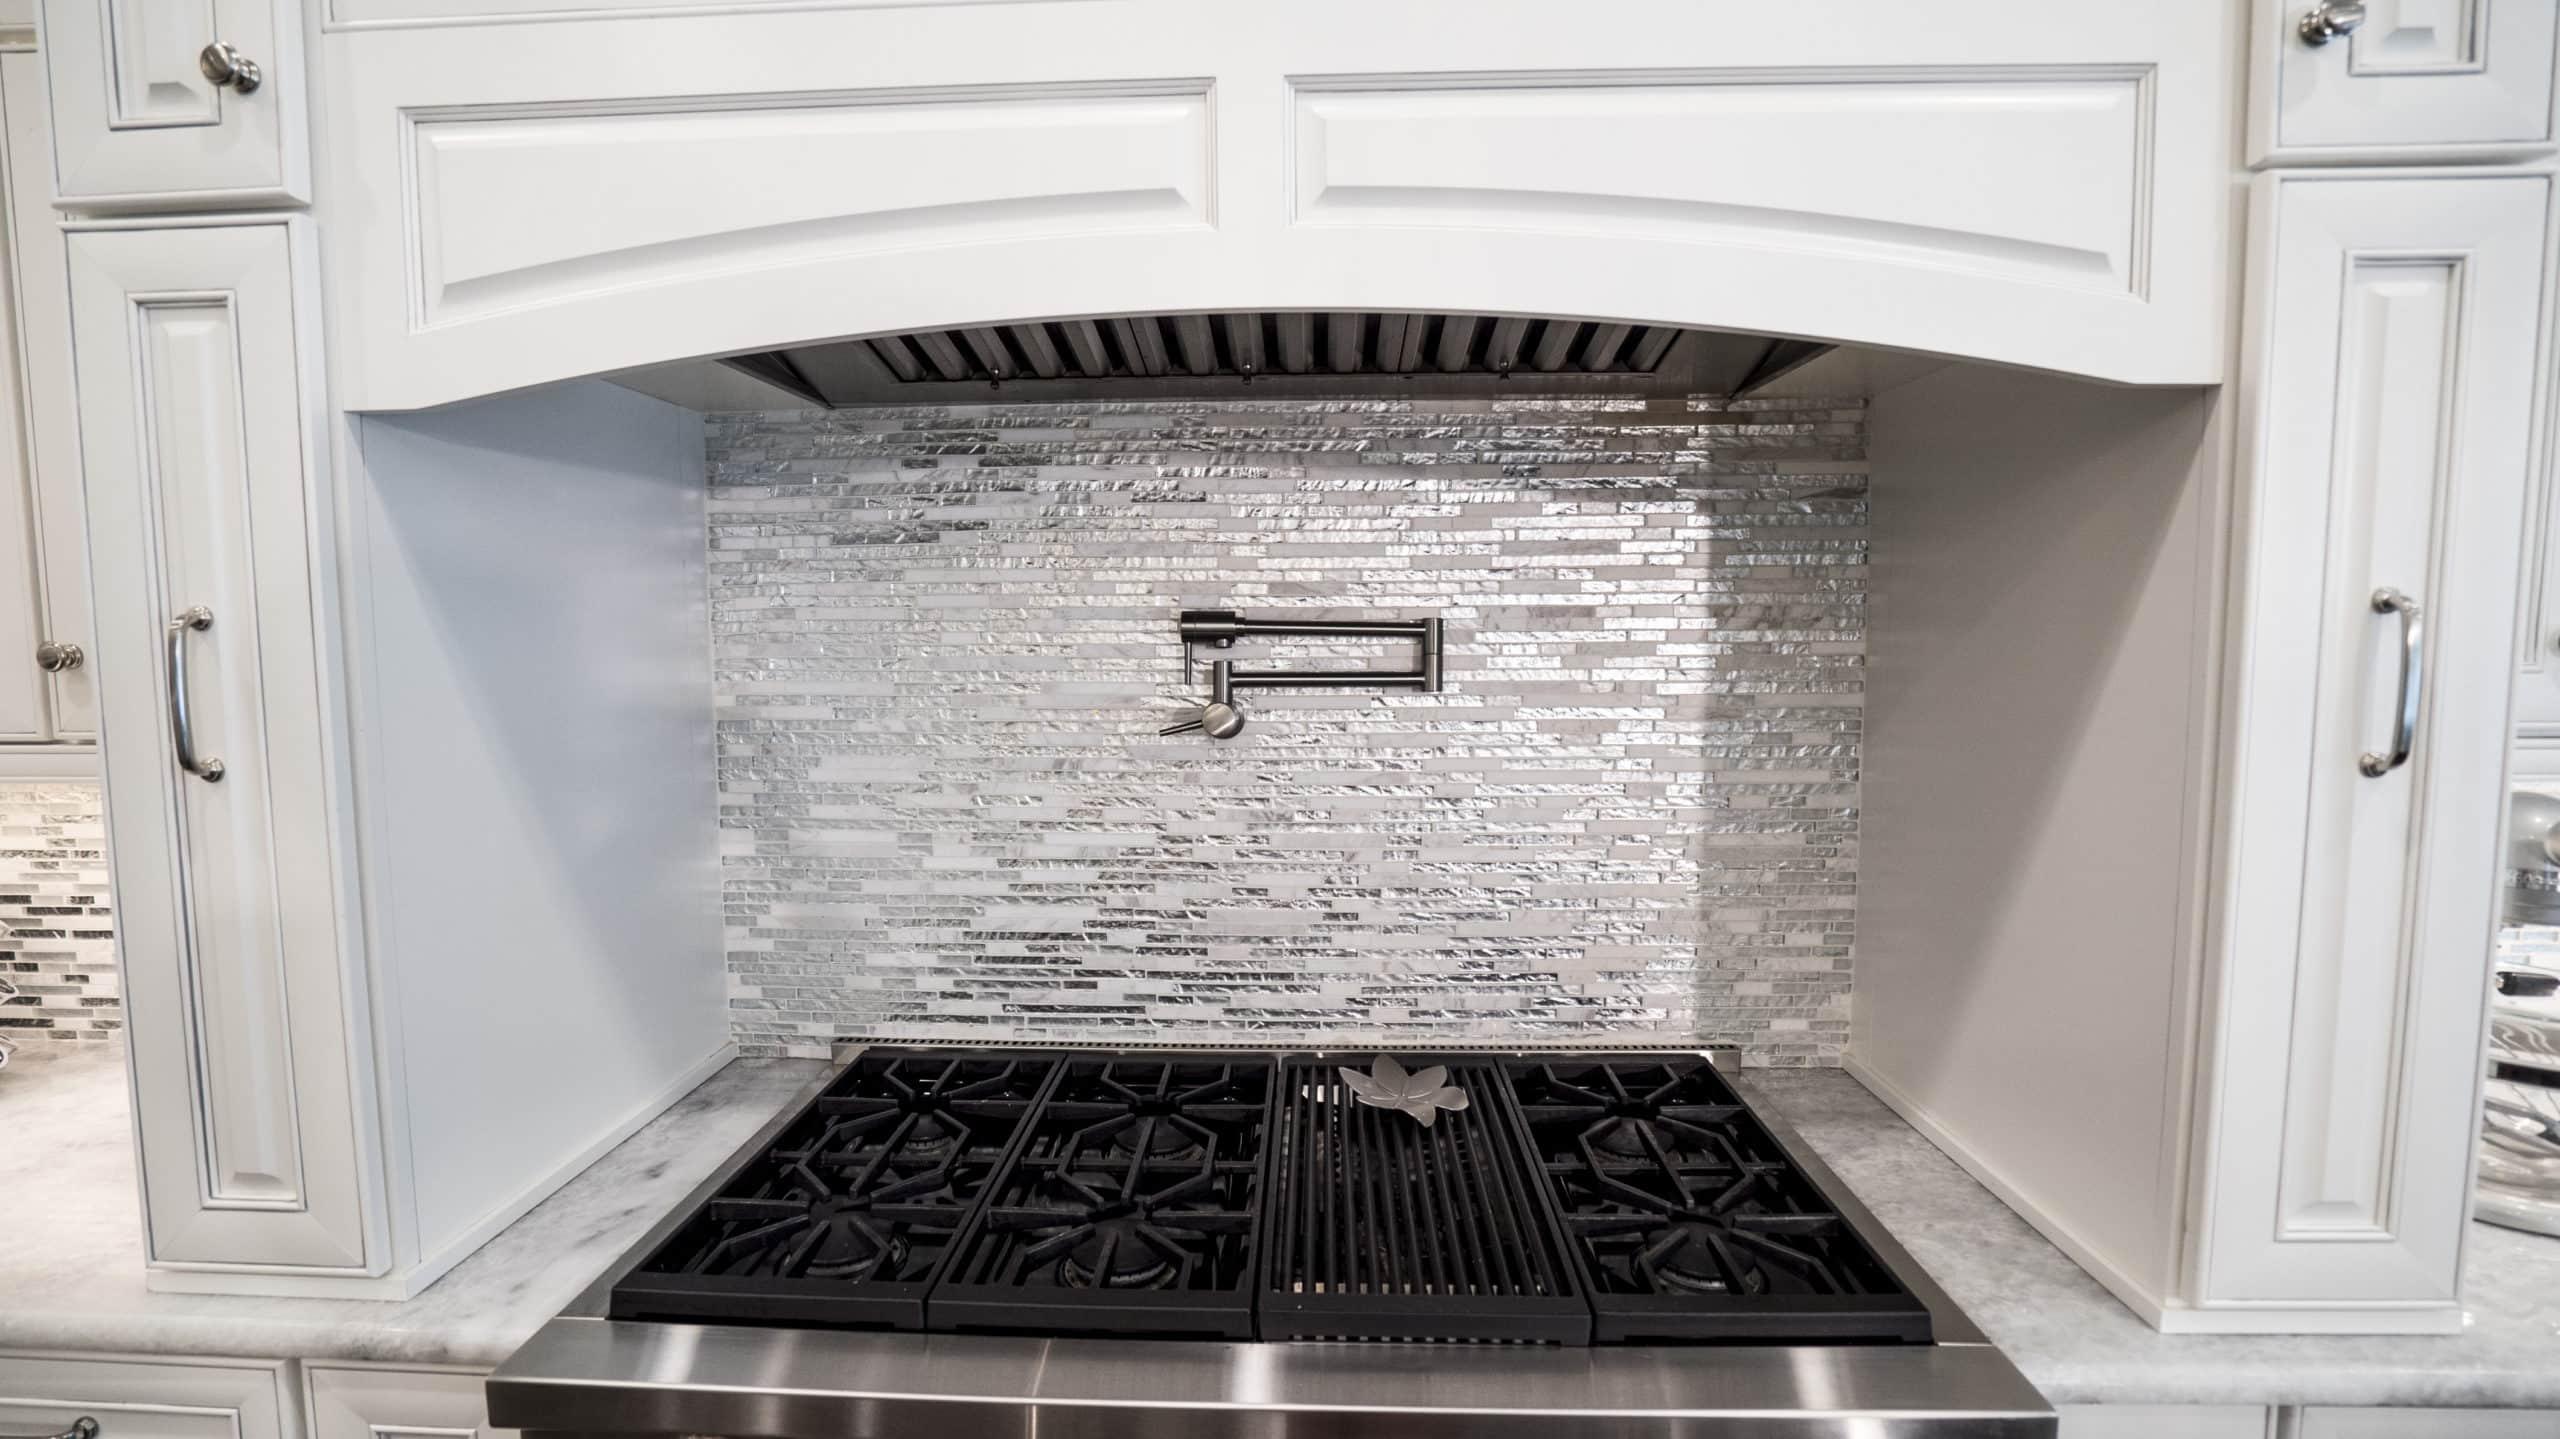 Naffa Project Kitchen Cabinets in Vienna VA